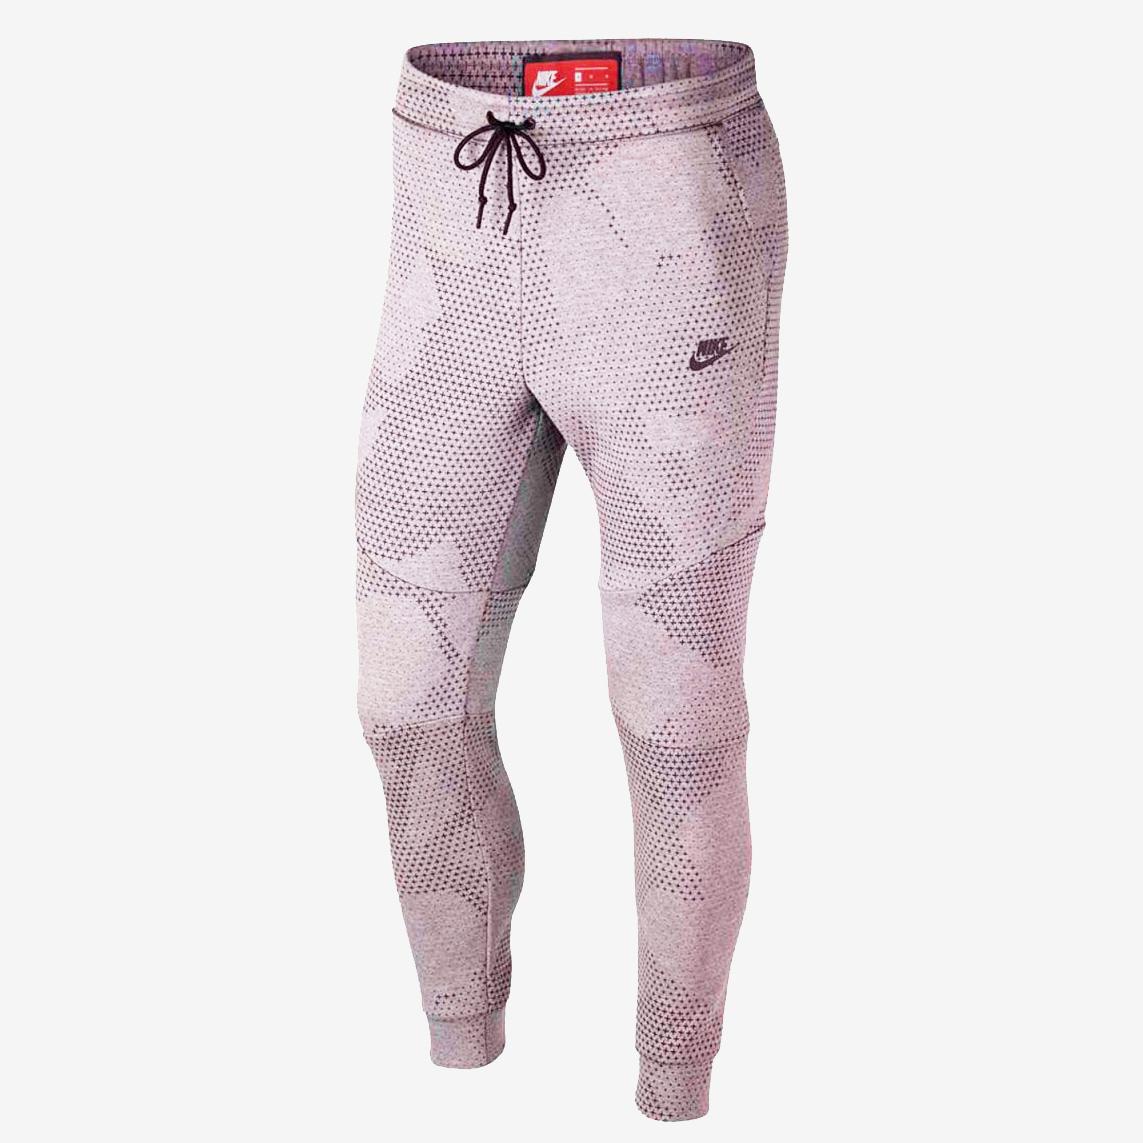 c1c6c8b547e5 Nike Sportswear Tech Fleece Pants - SPORTING GOODS Sports Pants -  Superfanas.lt